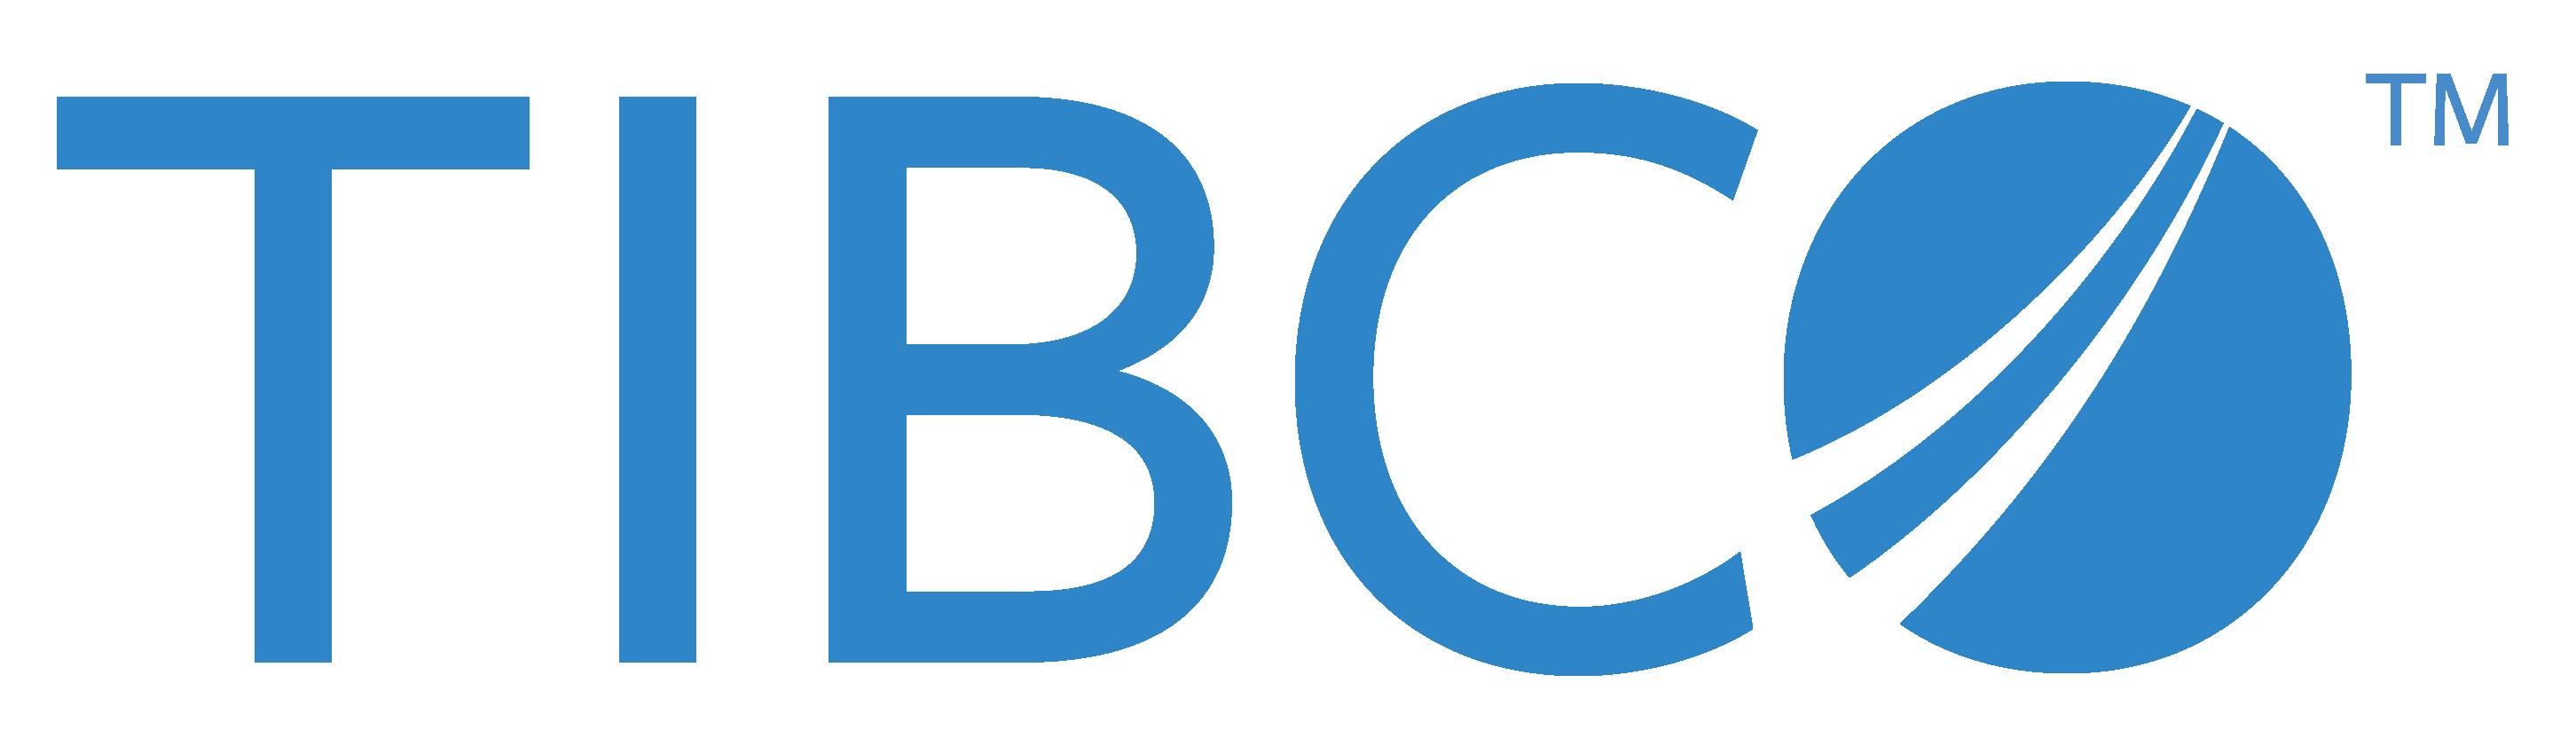 Tibco_logo-_Palo_Alto,_CA_company-_(PNG)_2013-11-24_16-00